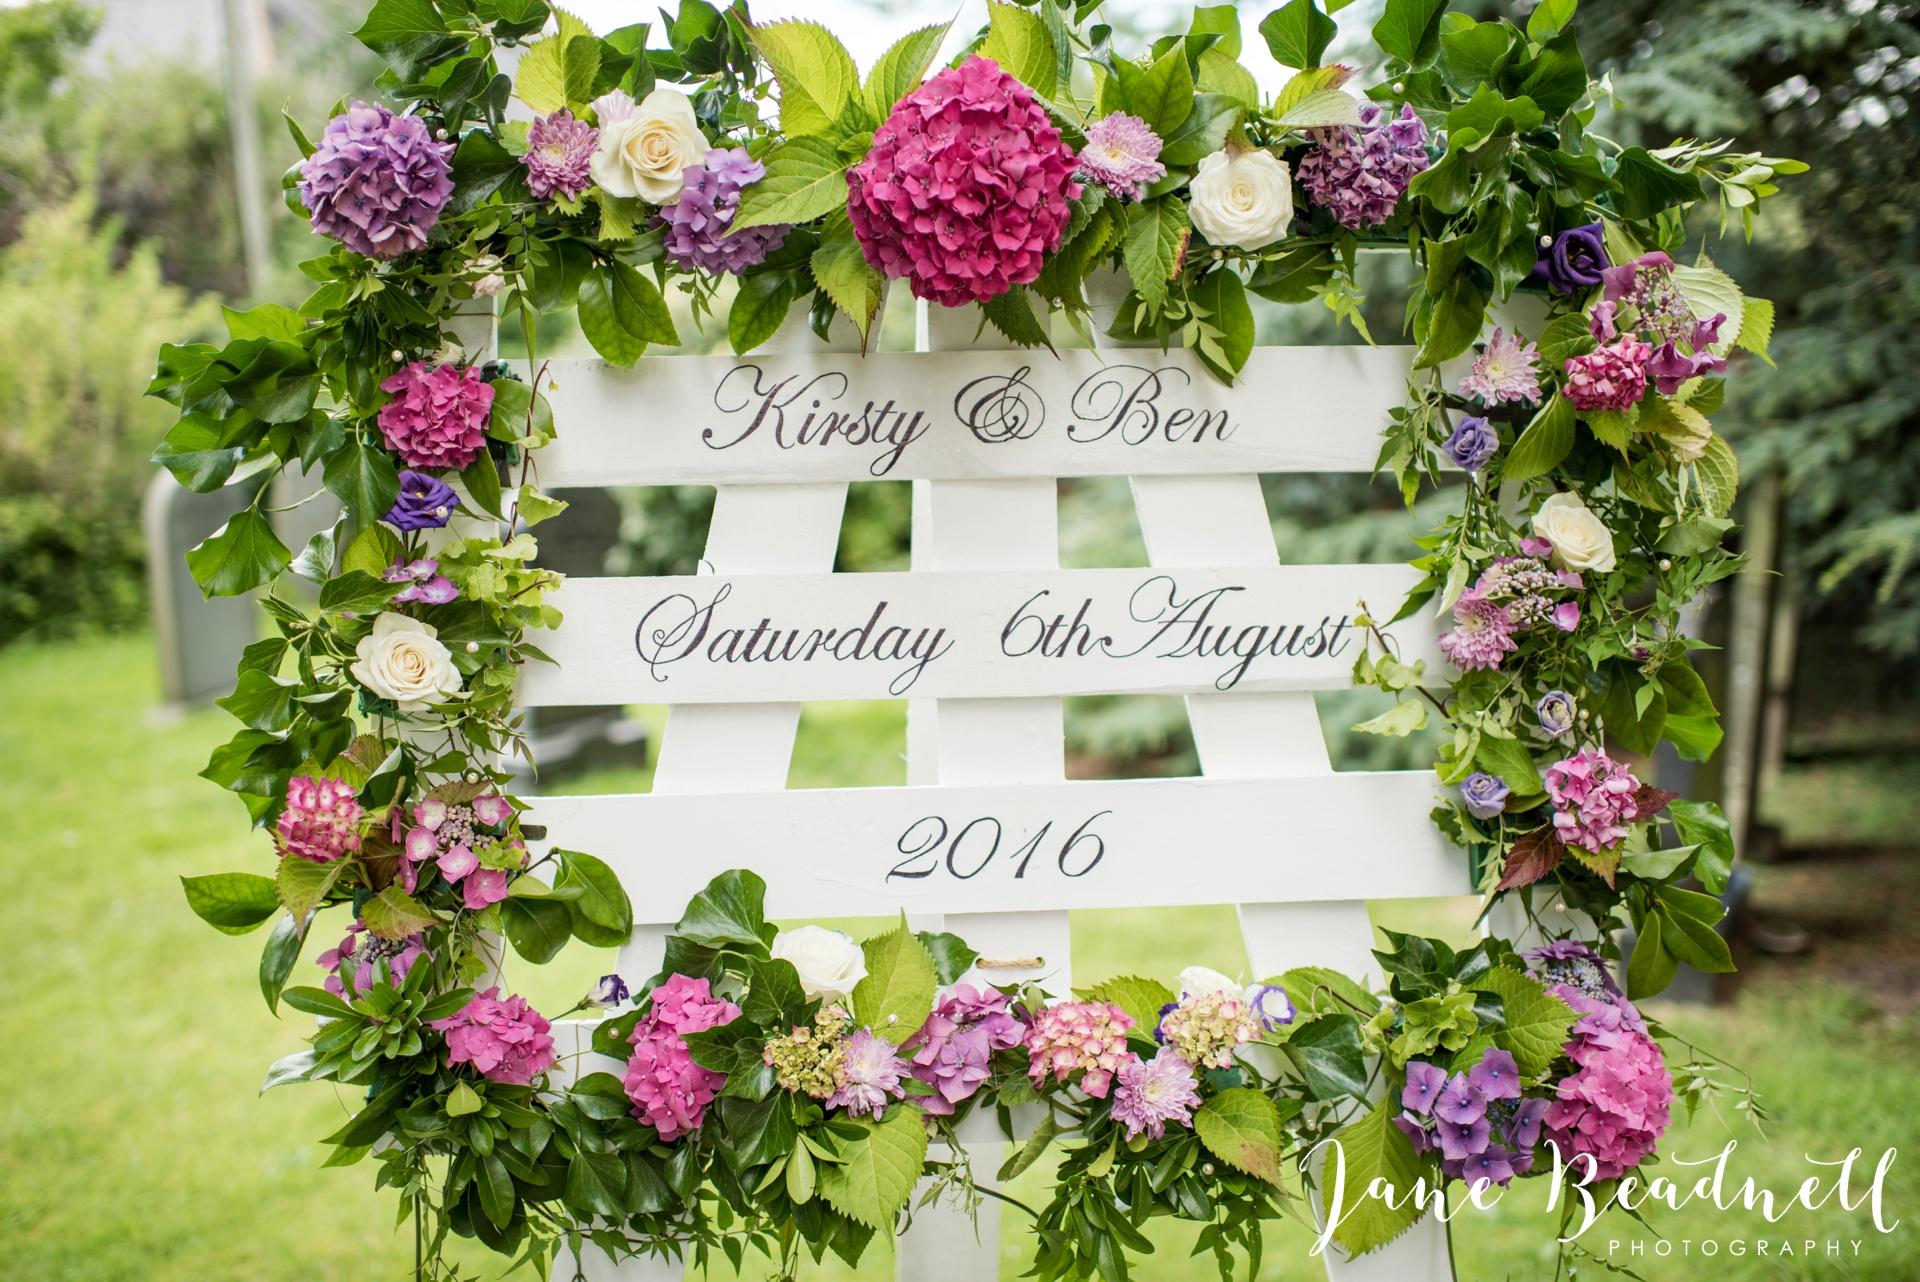 yorkshire-fine-art-wedding-photographer-jane-beadnell-photography-poppleton-york_0031